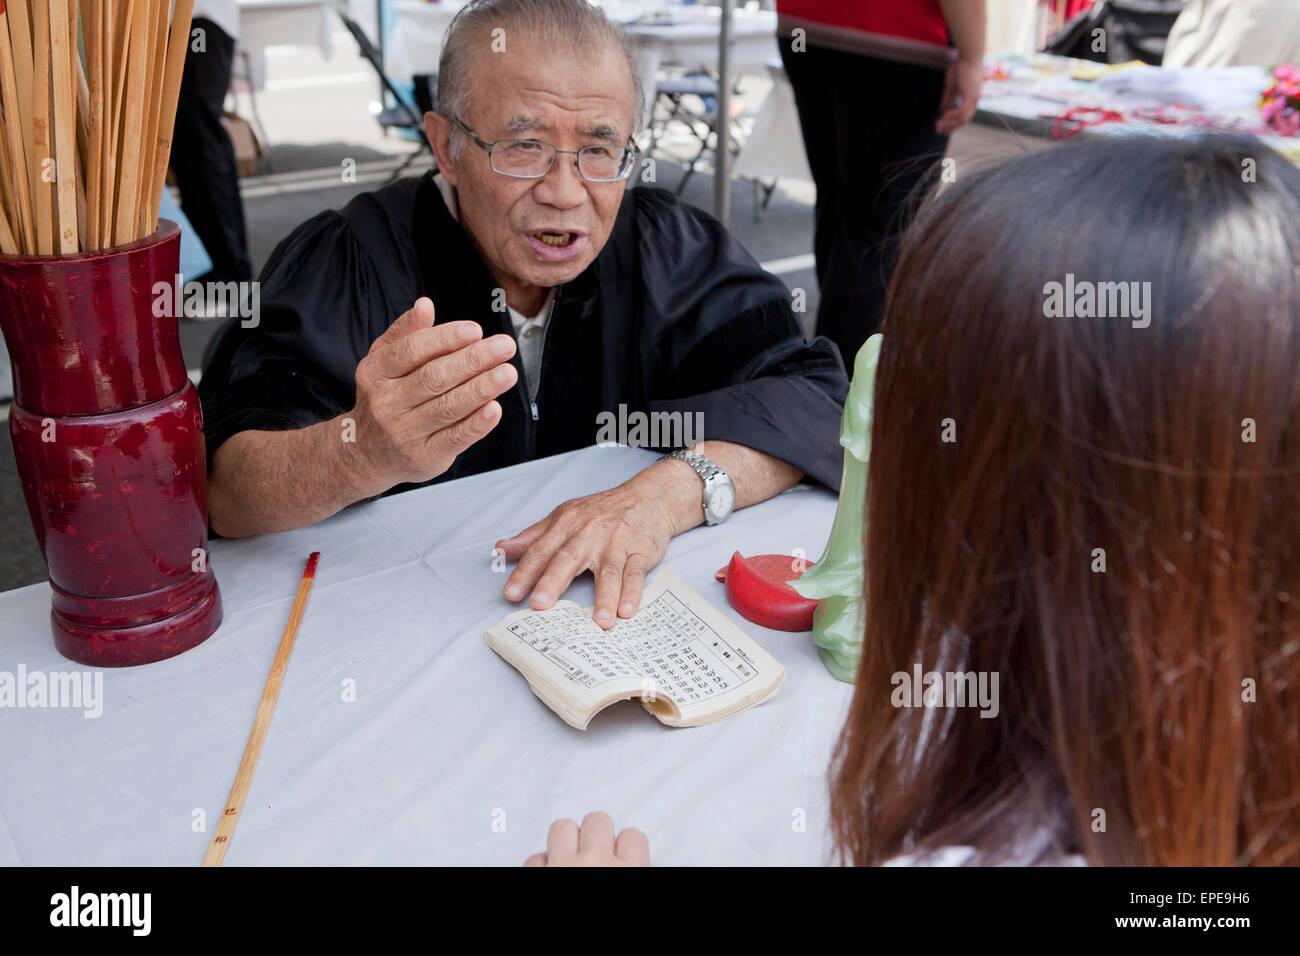 Chinese fortune teller, National Asian Heritage Festival - Washington, DC USA - Stock Image